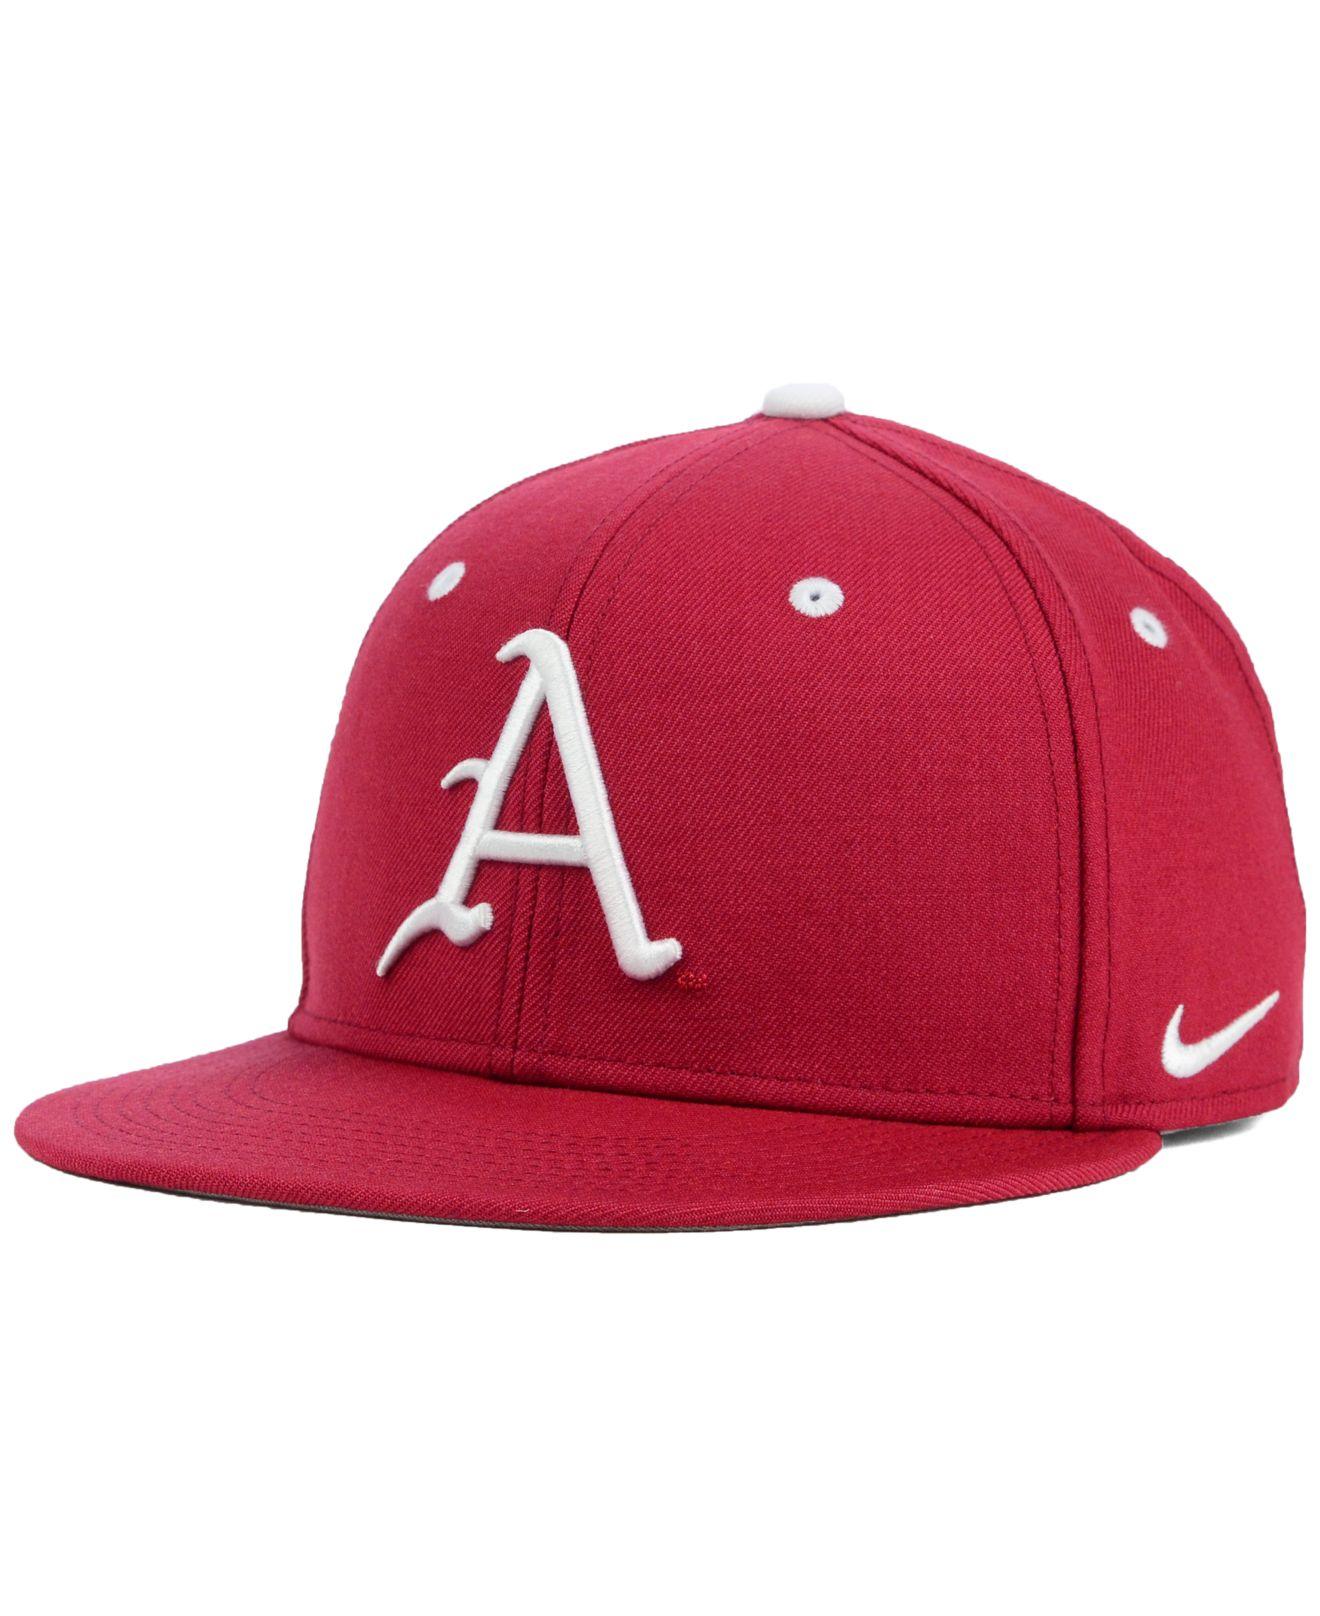 8f608f1b ... canada lyst nike arkansas razorbacks true college fitted cap in pink for  men d71ba 5cd7f